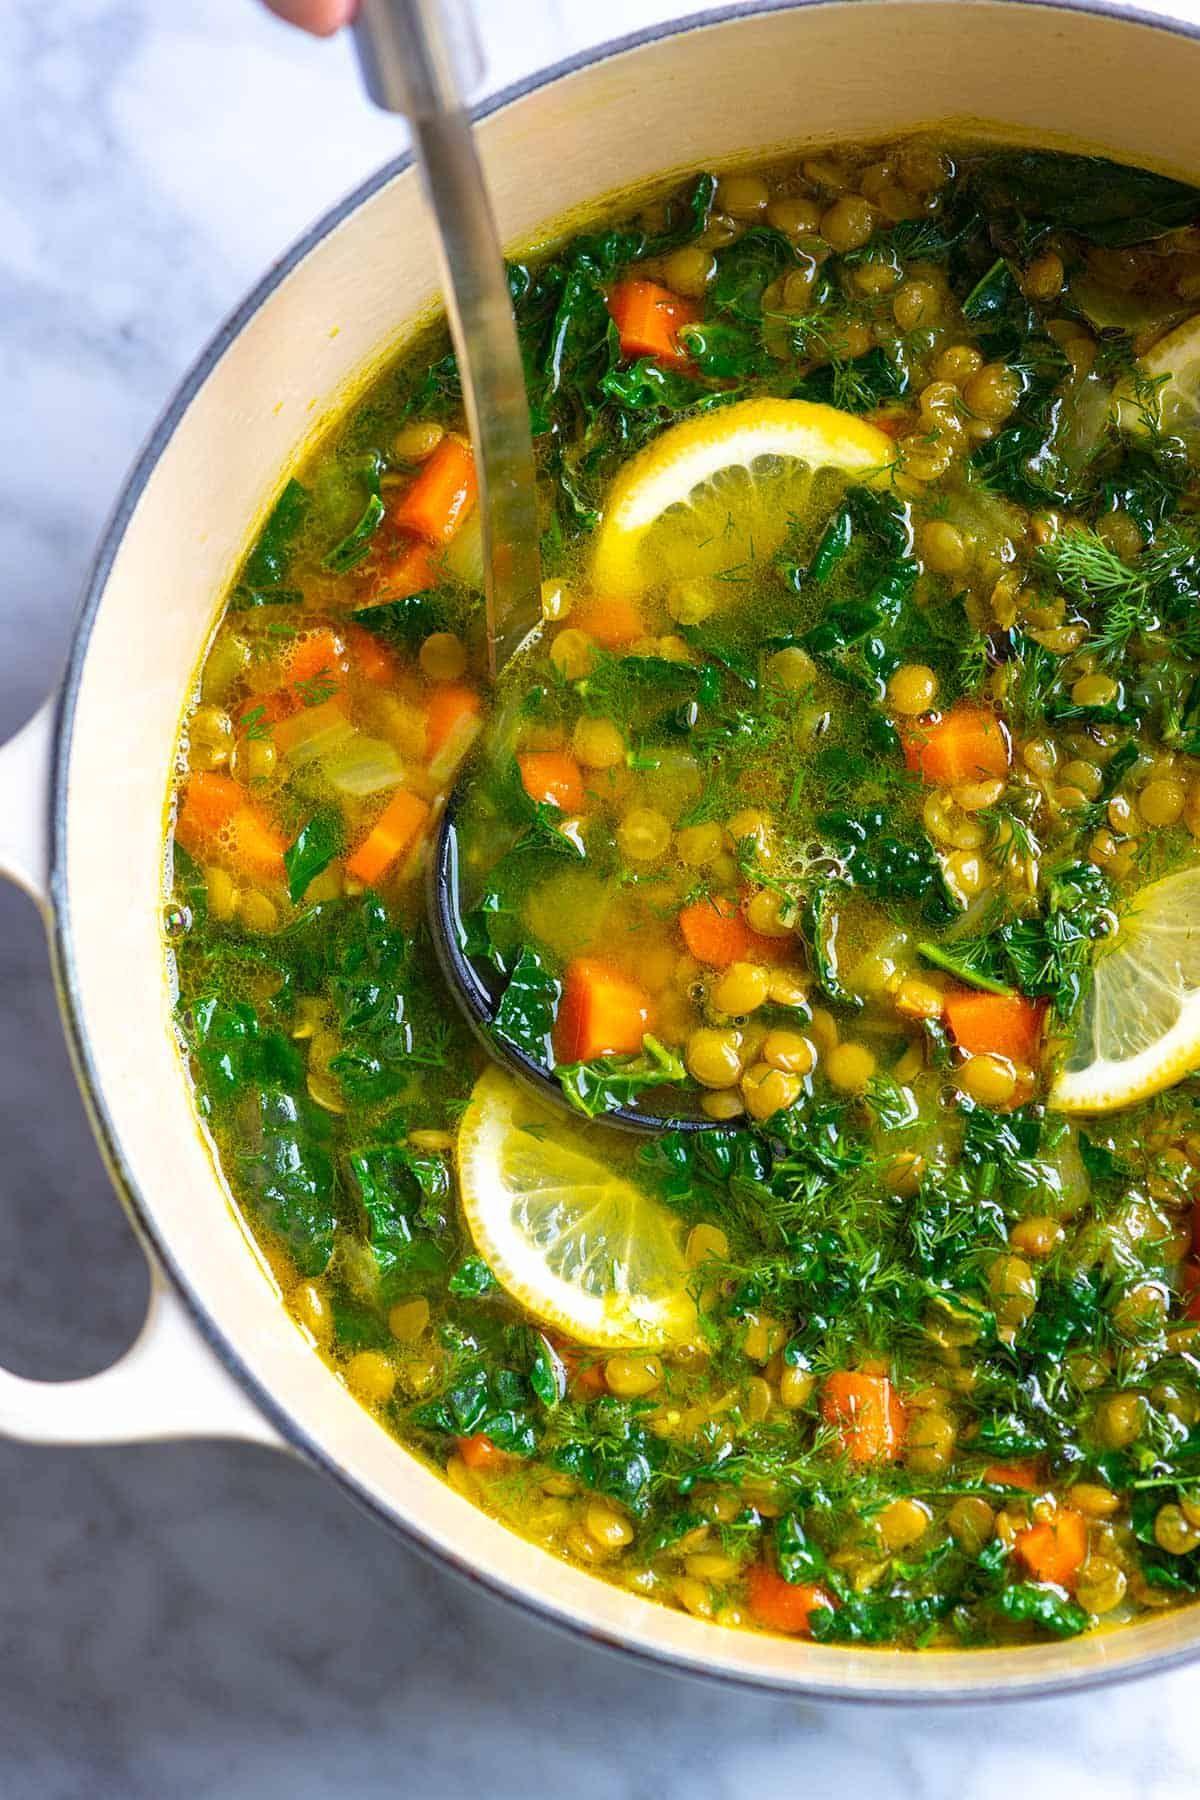 Lentil Soup with Lemon and Turmeric